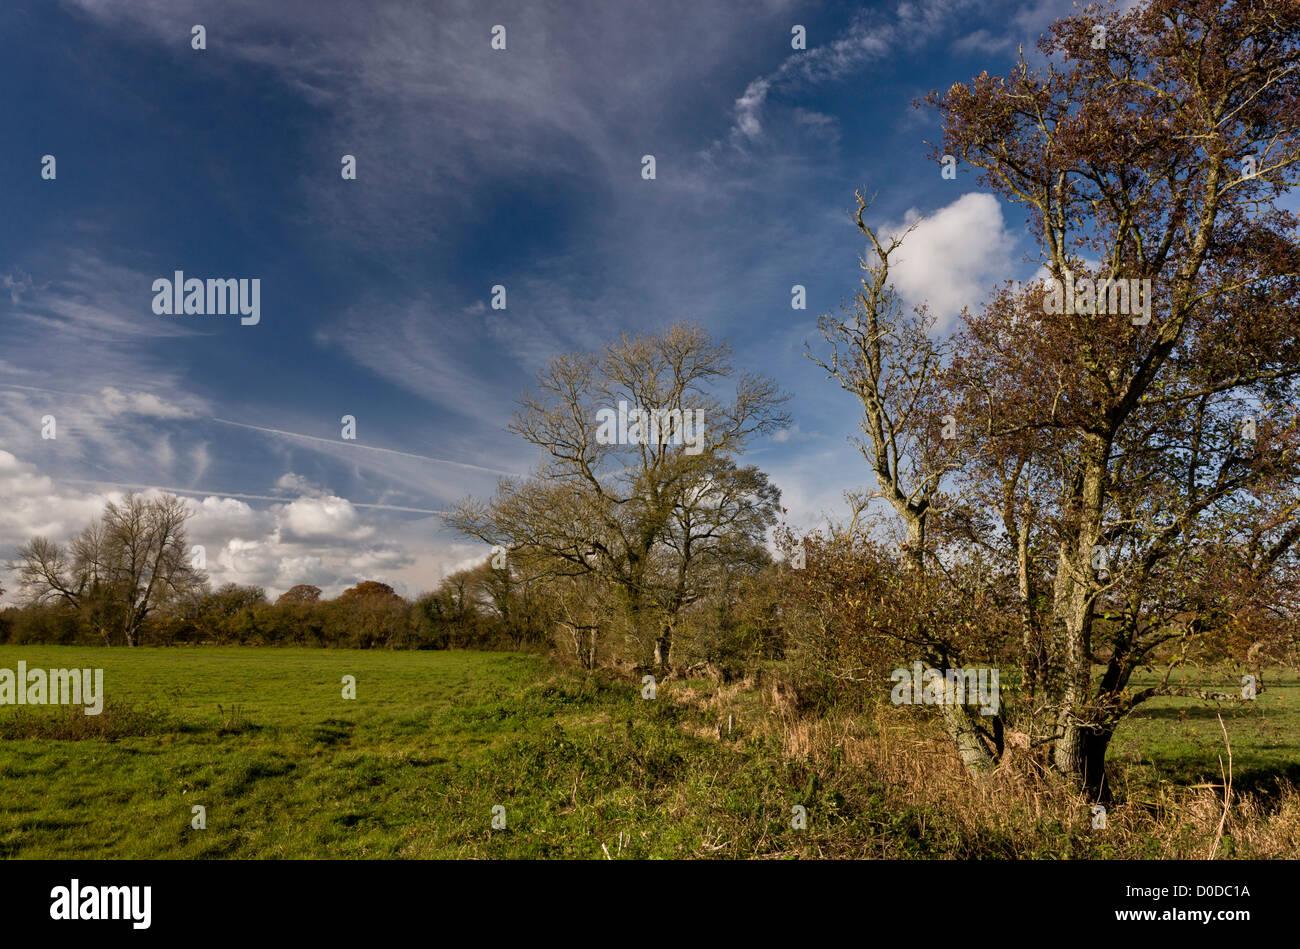 Stour Valley floodplain at Fiddleford, with alder, ash, and black poplar trees,  Dorset, England, UK - Stock Image